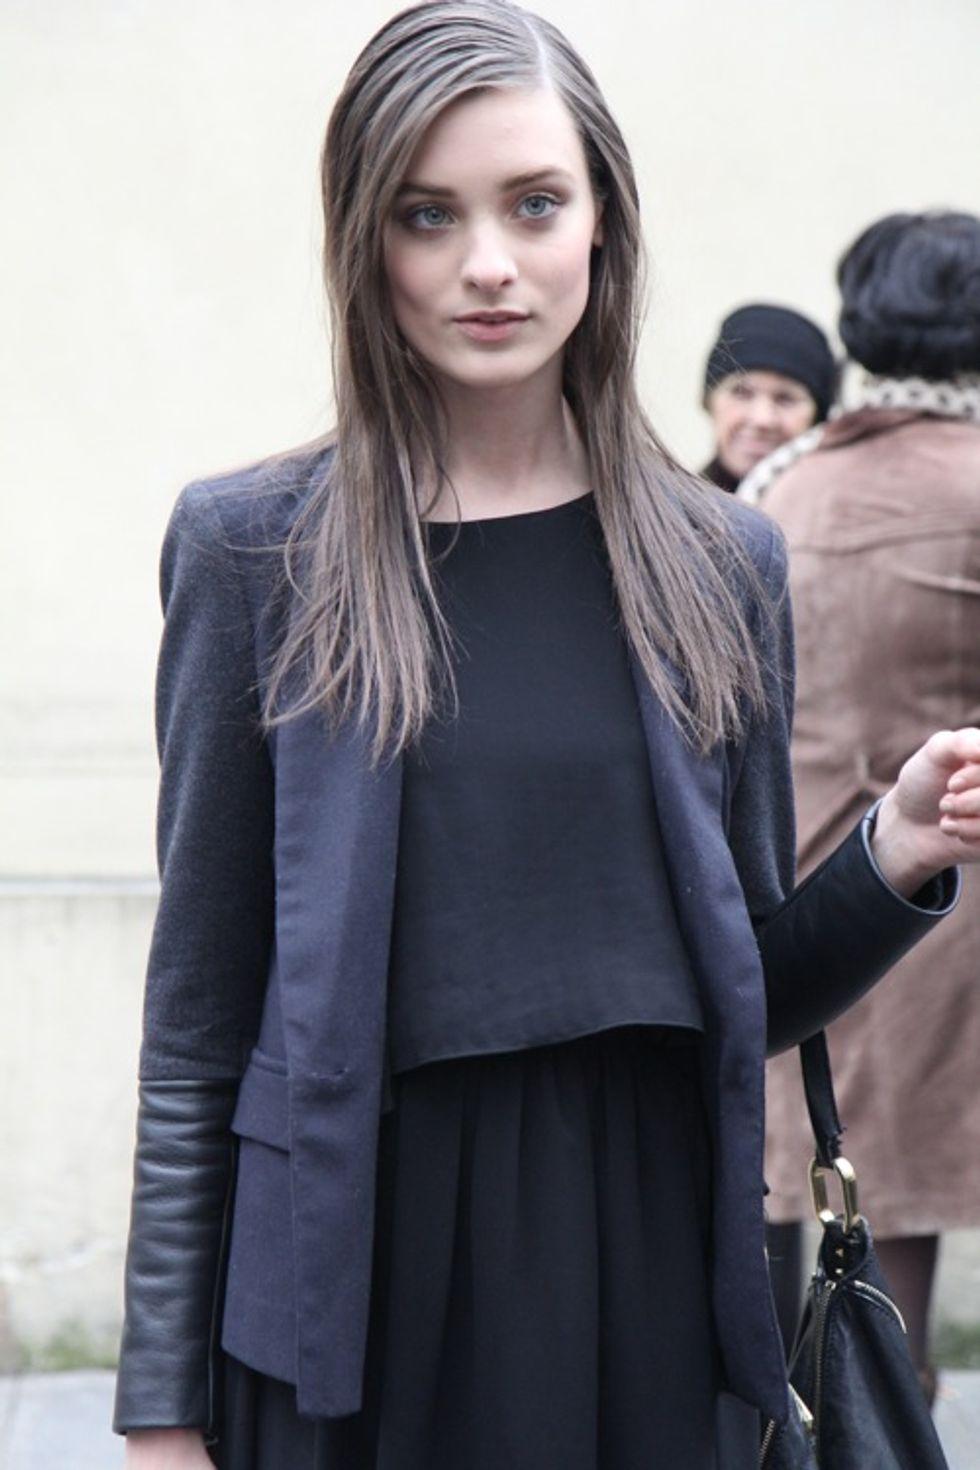 Street Scenes from Paris Fashion Week